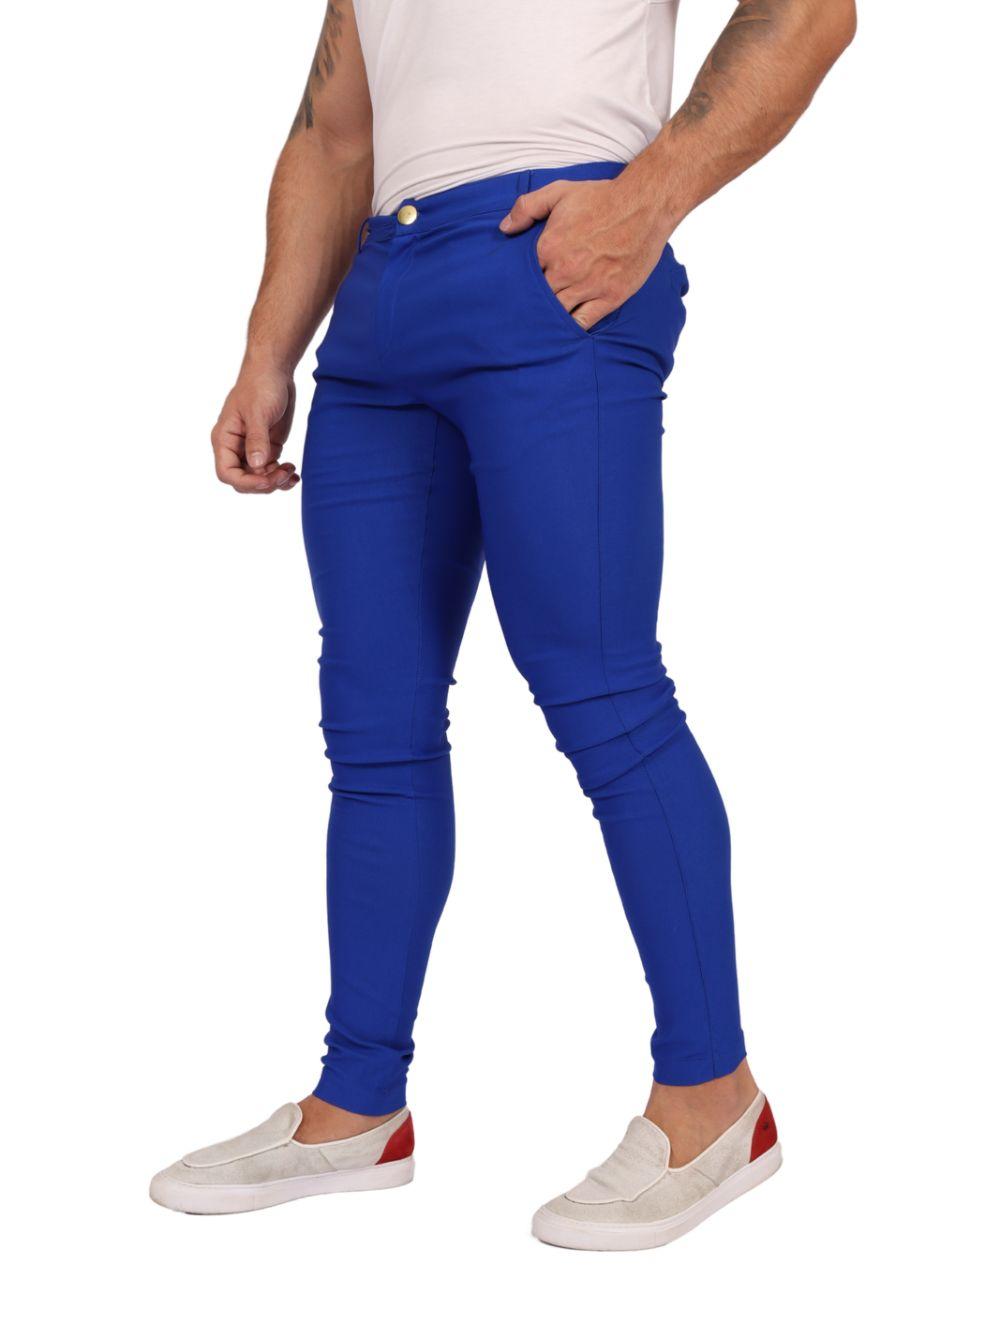 Calça Bengaline Azul Royal Ultra Skinny